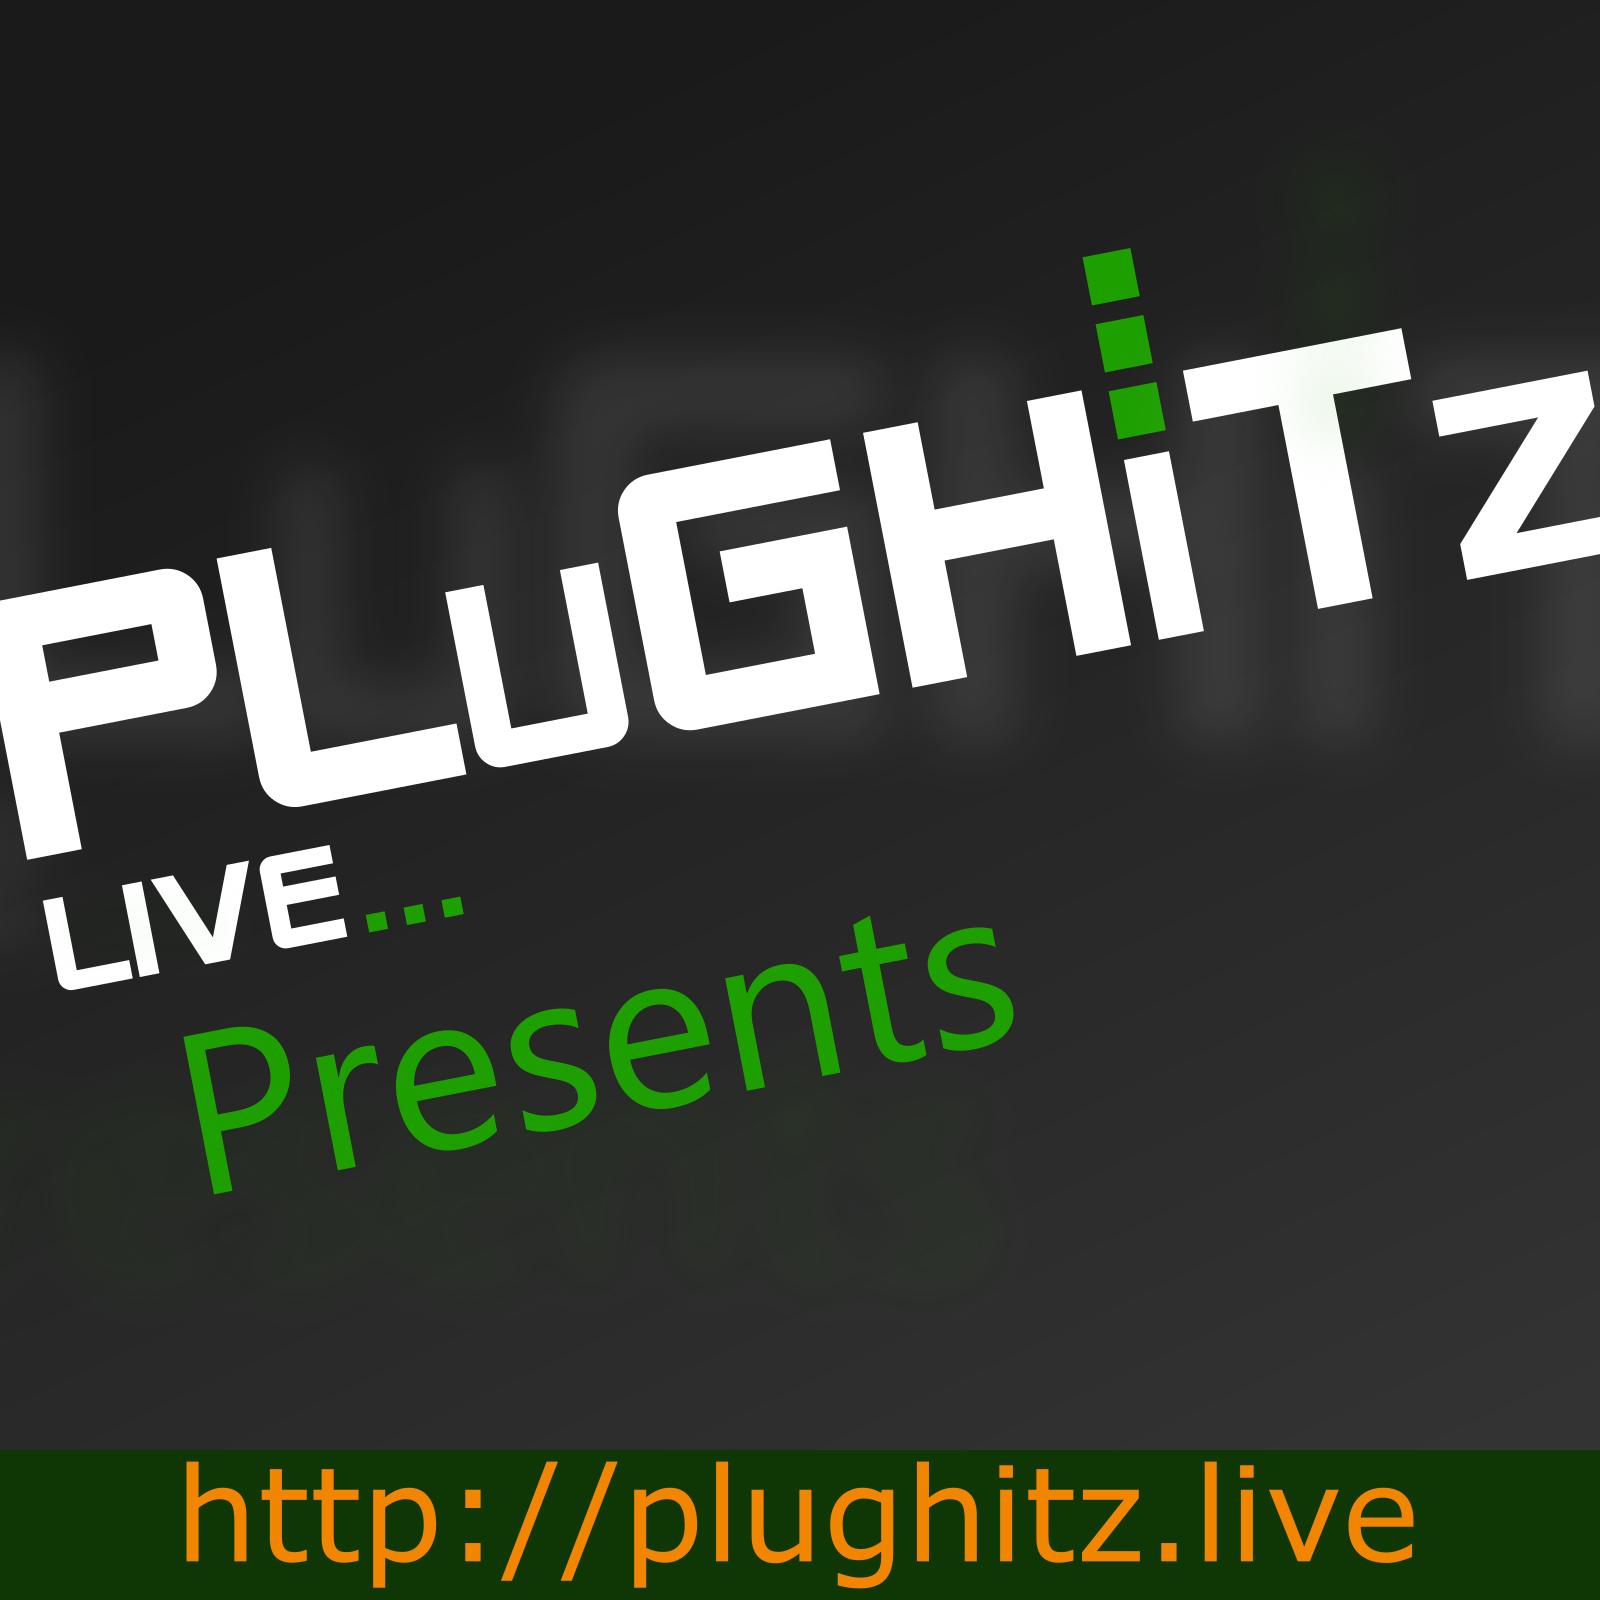 PLuGHiTz Live Presents - PLuGHiTz Live